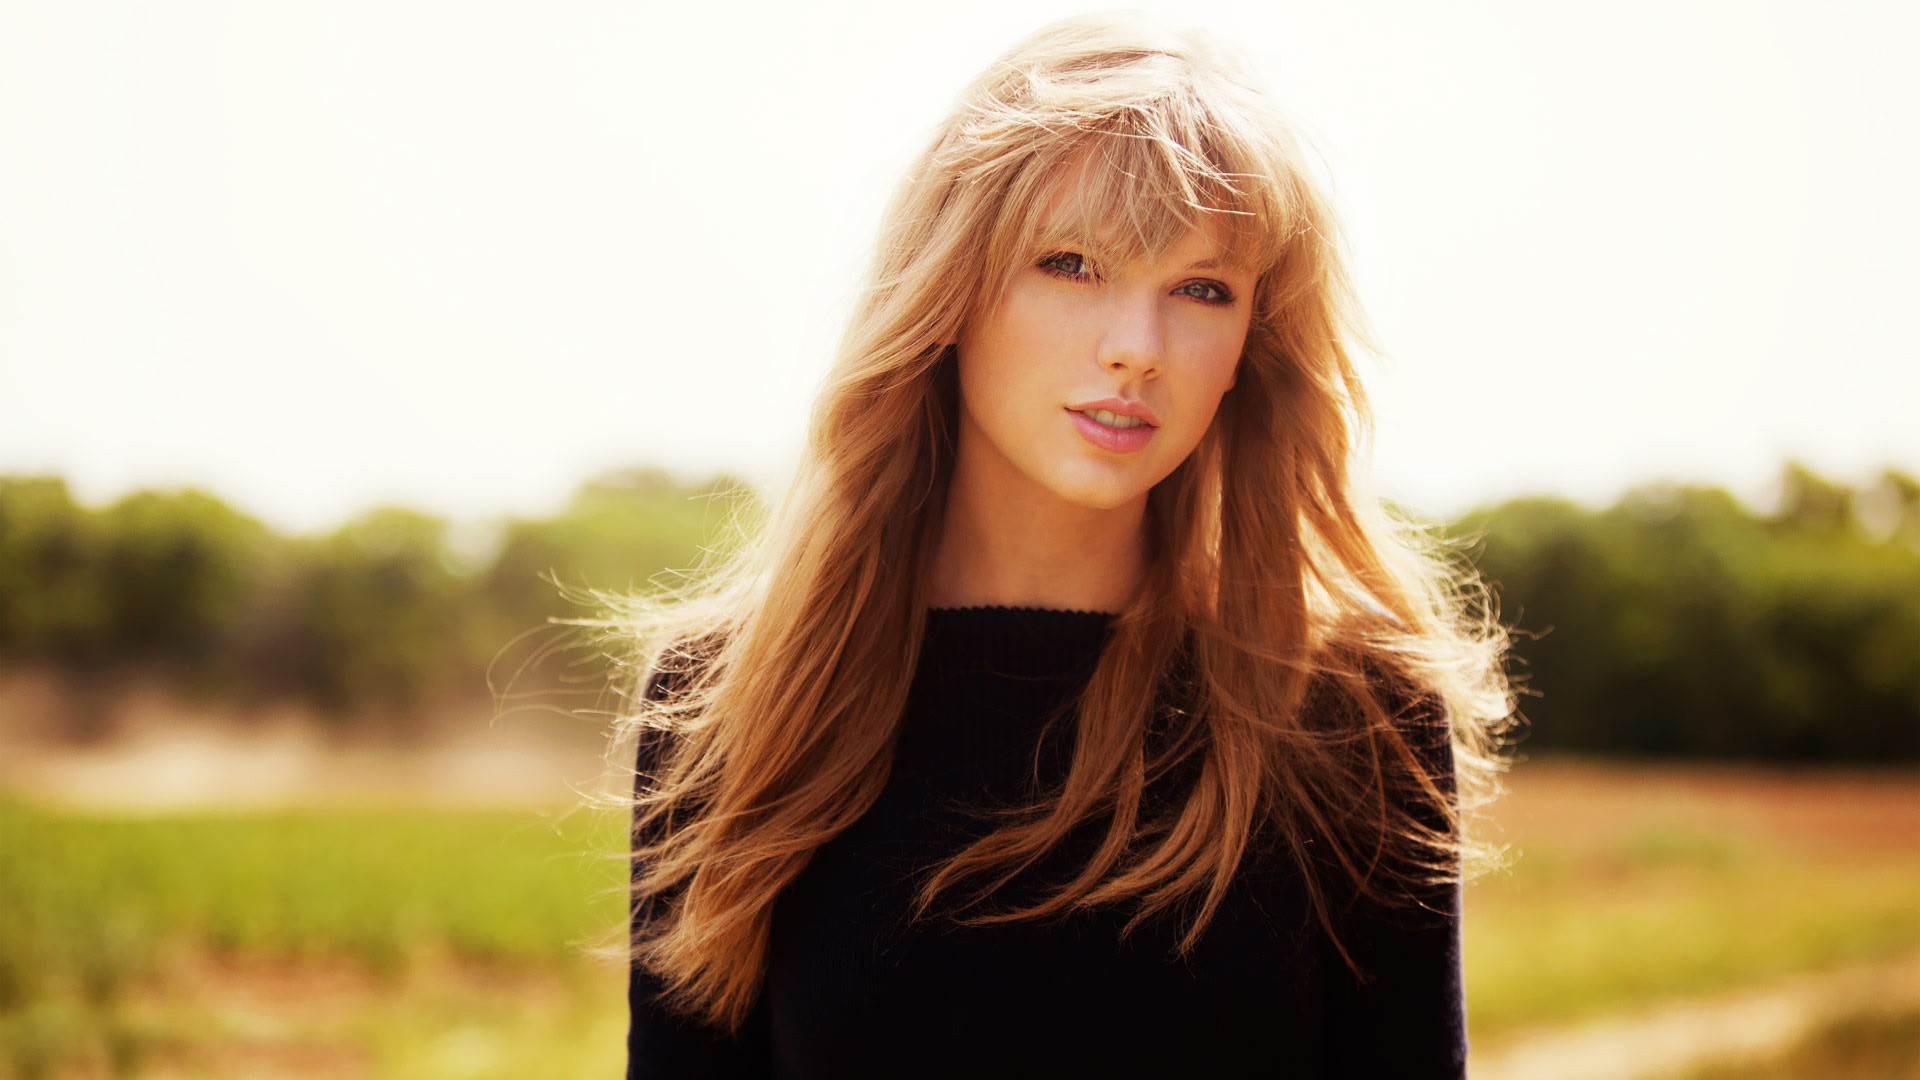 Taylor swift black sweater